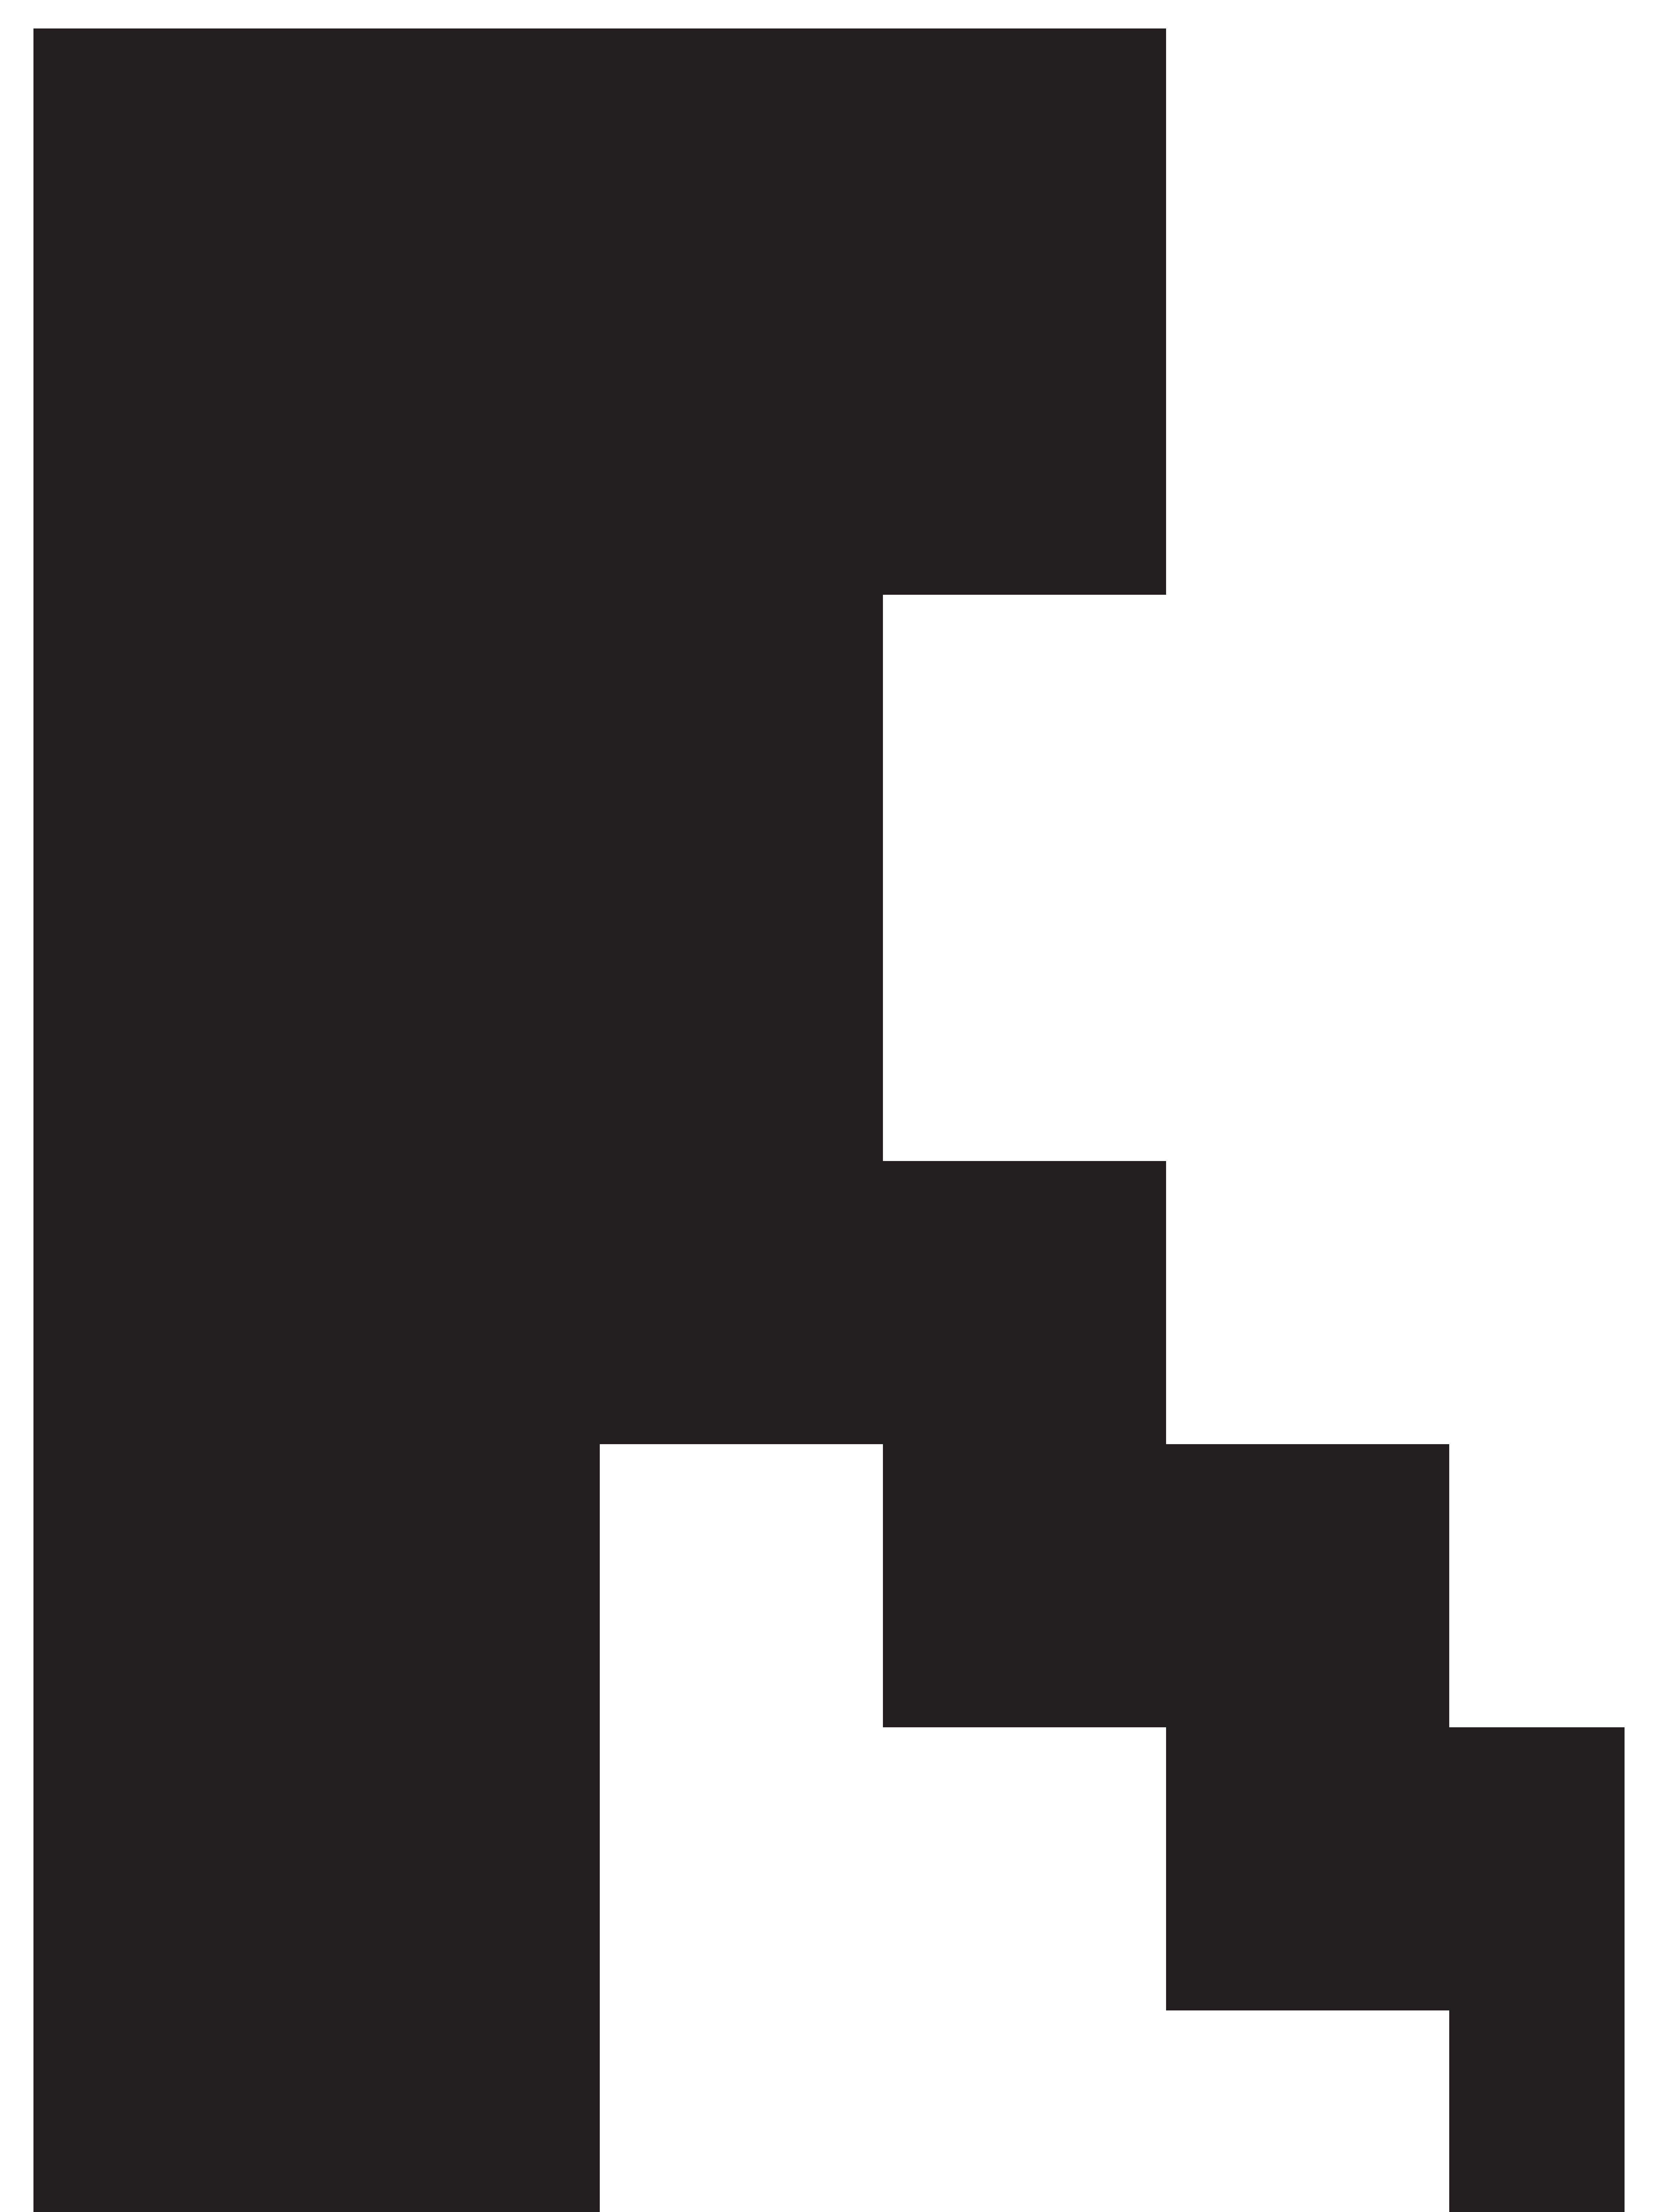 Golf Silhouette Clip art.